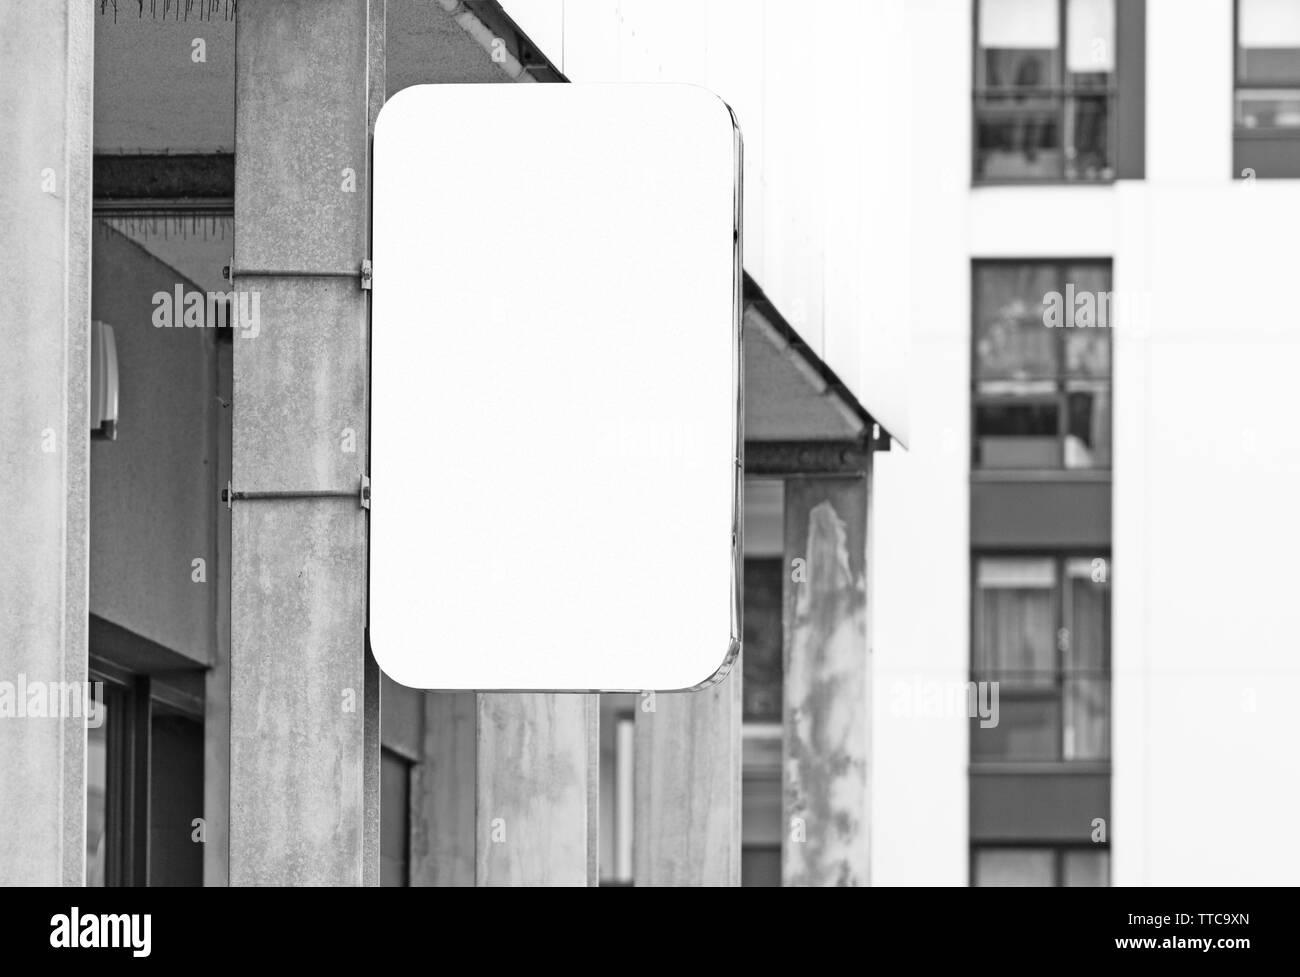 Hanging Wall Signboard Jpeg Mockup Modern Style Outdoor Signage